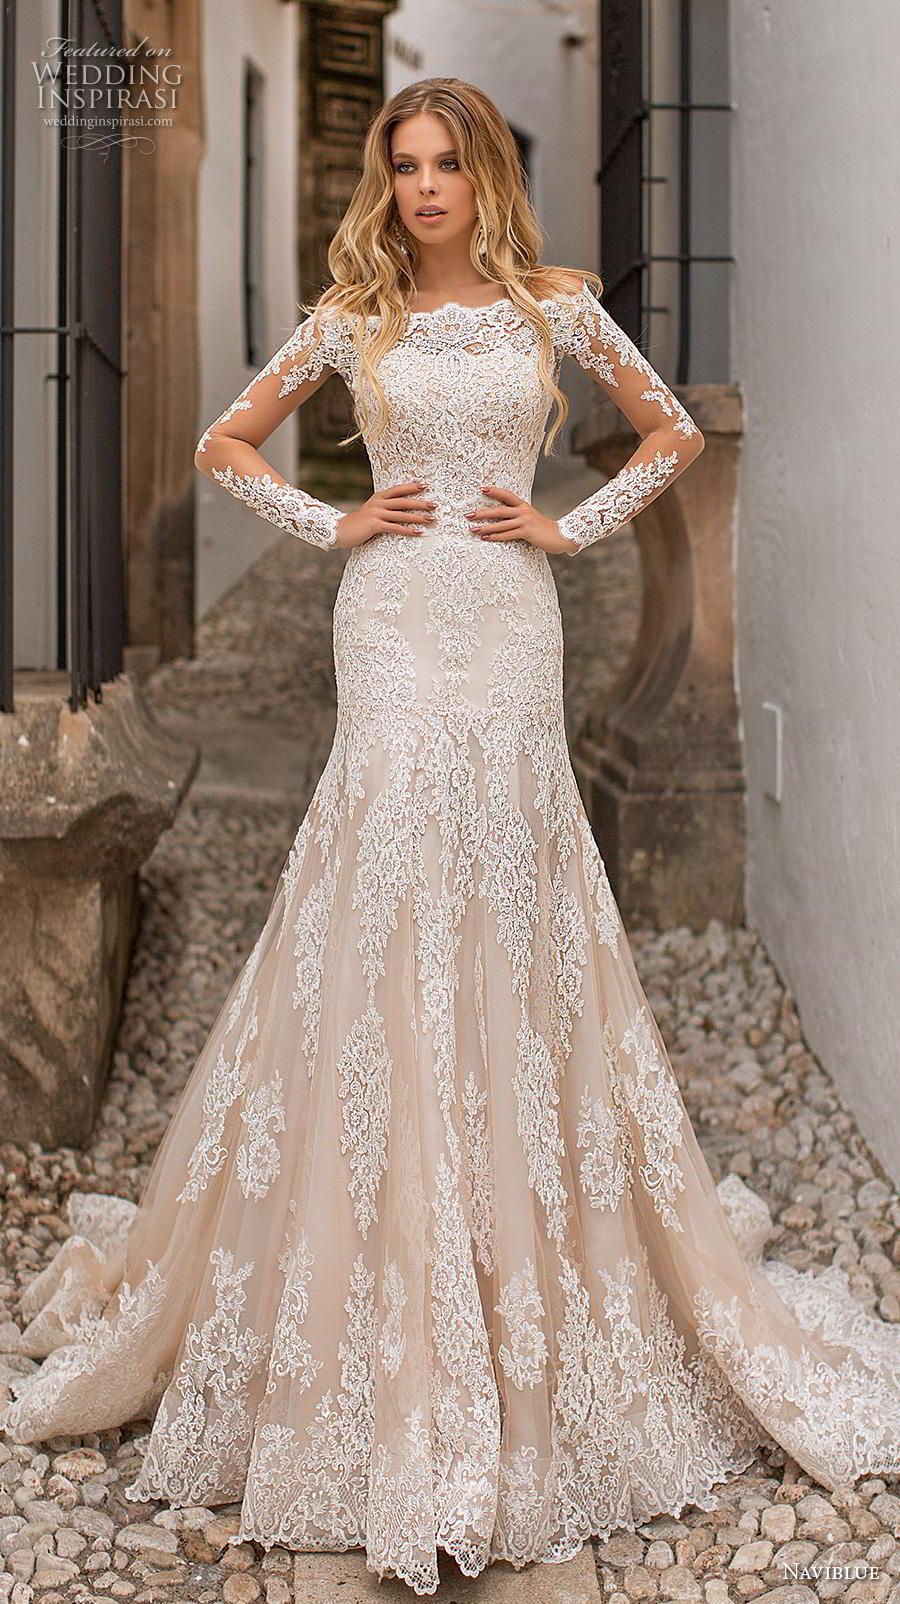 naviblue 2019 bridal long sleeves bateau neck full embellishment drop waist champagne a line wedding dress lace back chapel train (5) mv